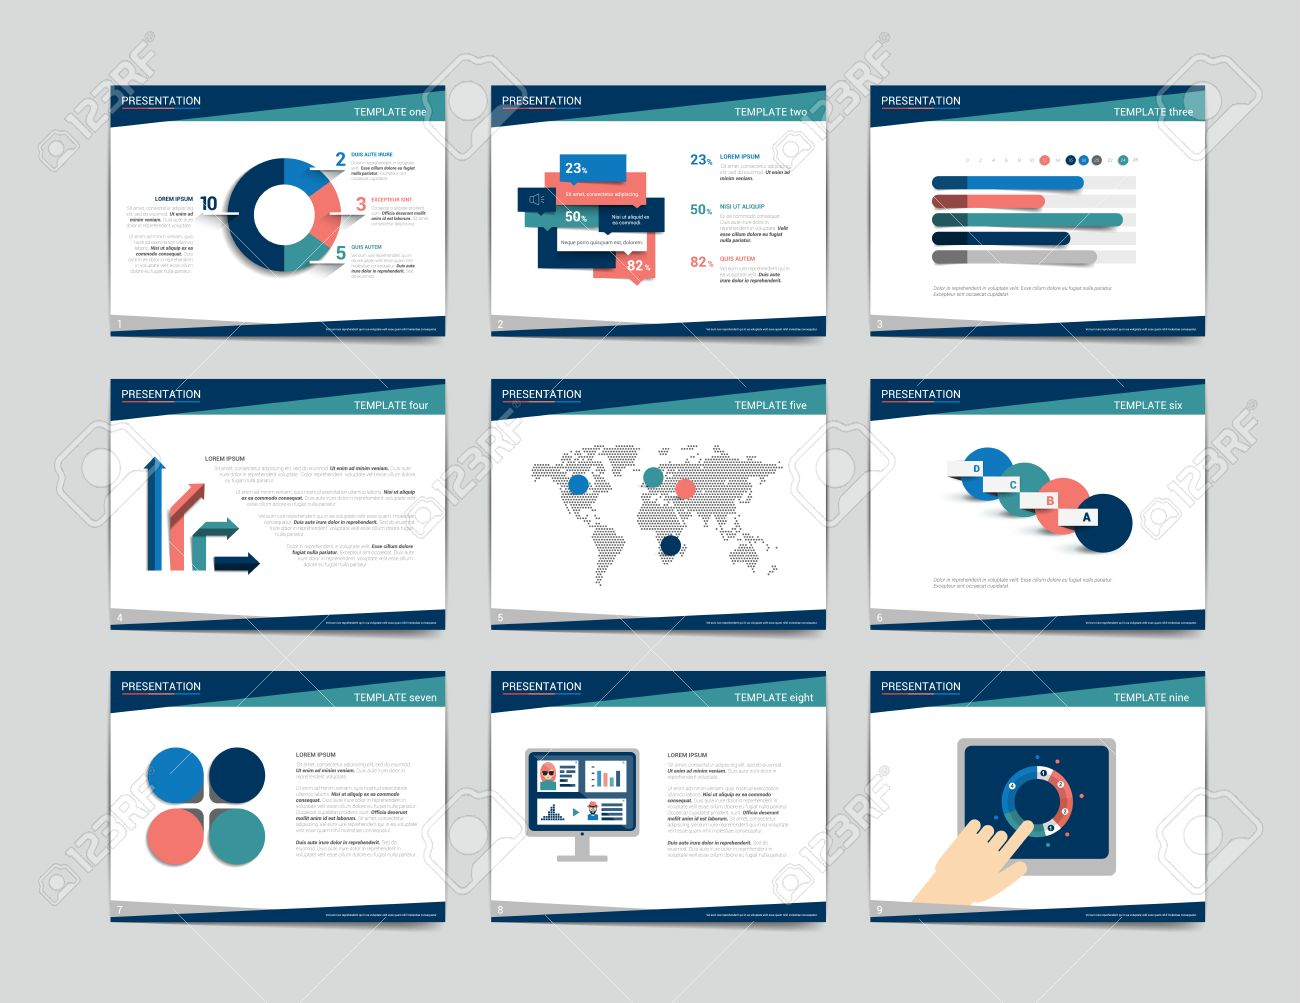 Templates for business presentation pertamini templates for business presentation malvernweather Choice Image